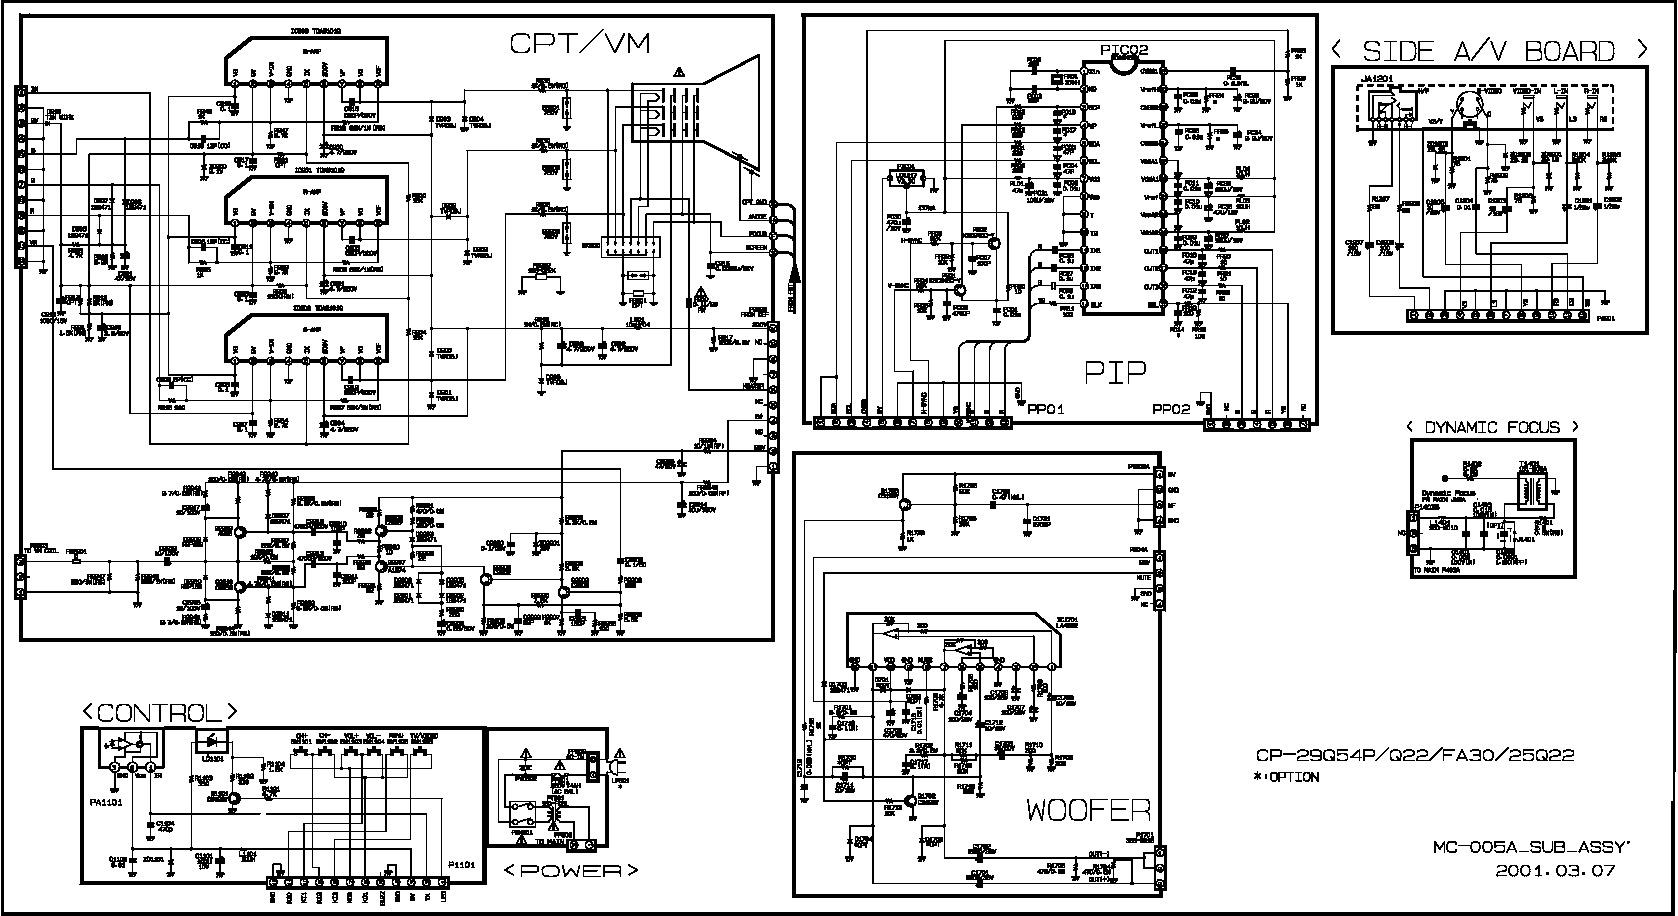 2001 1200 buell cyclone wiring diagram 2001 buell